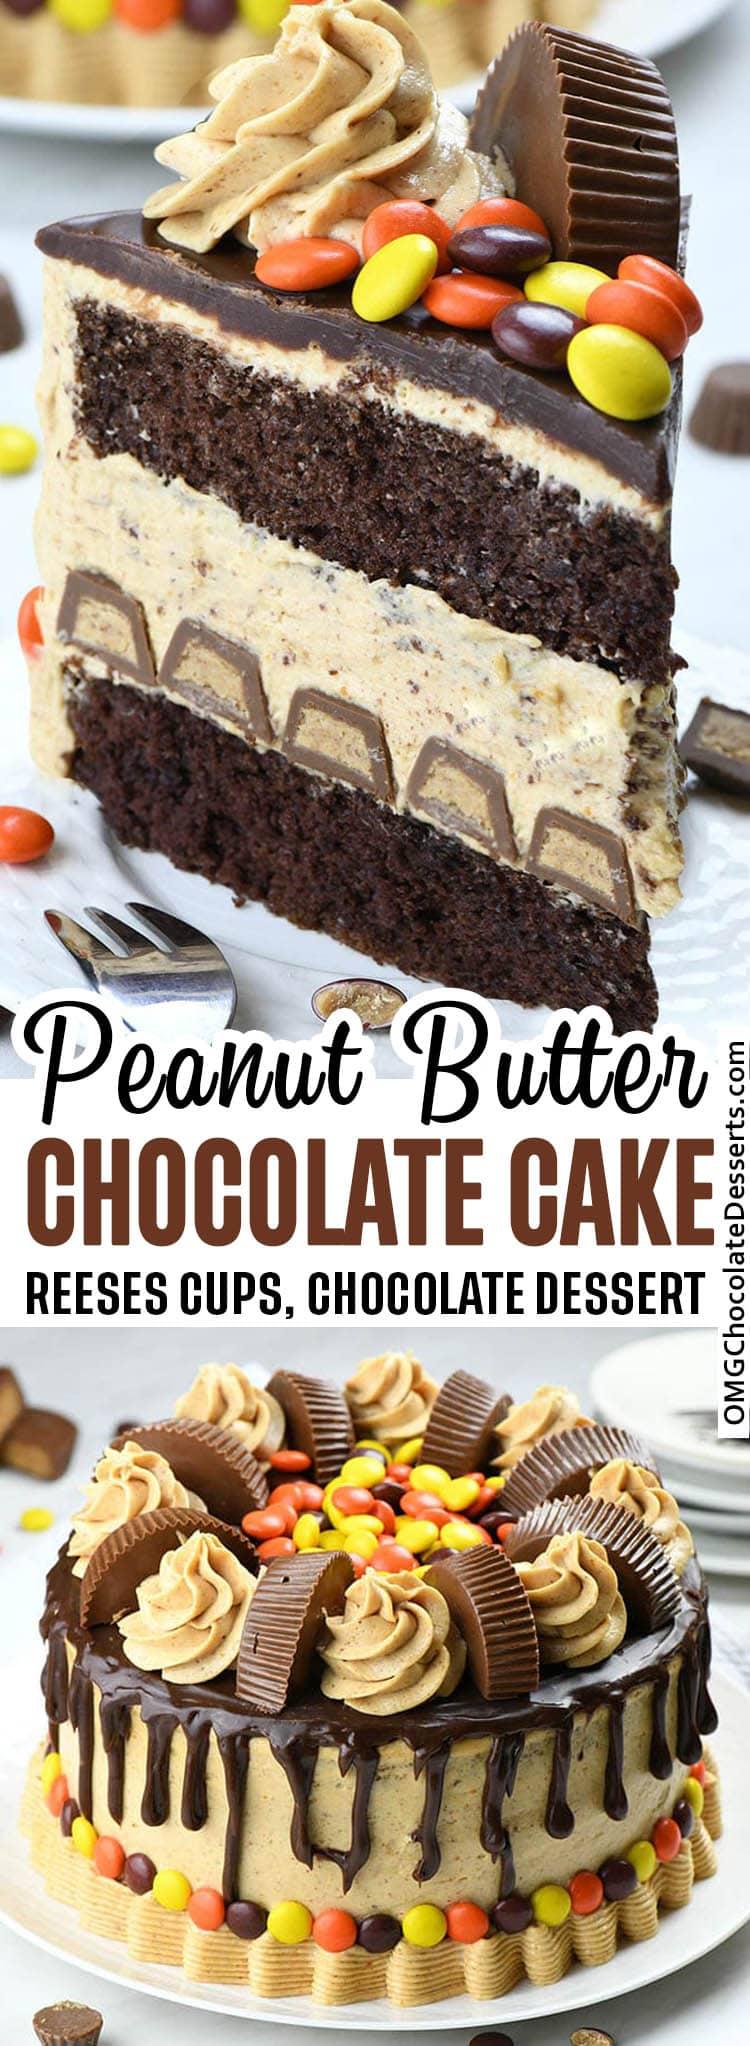 Peanut Butter Chocolate Cake